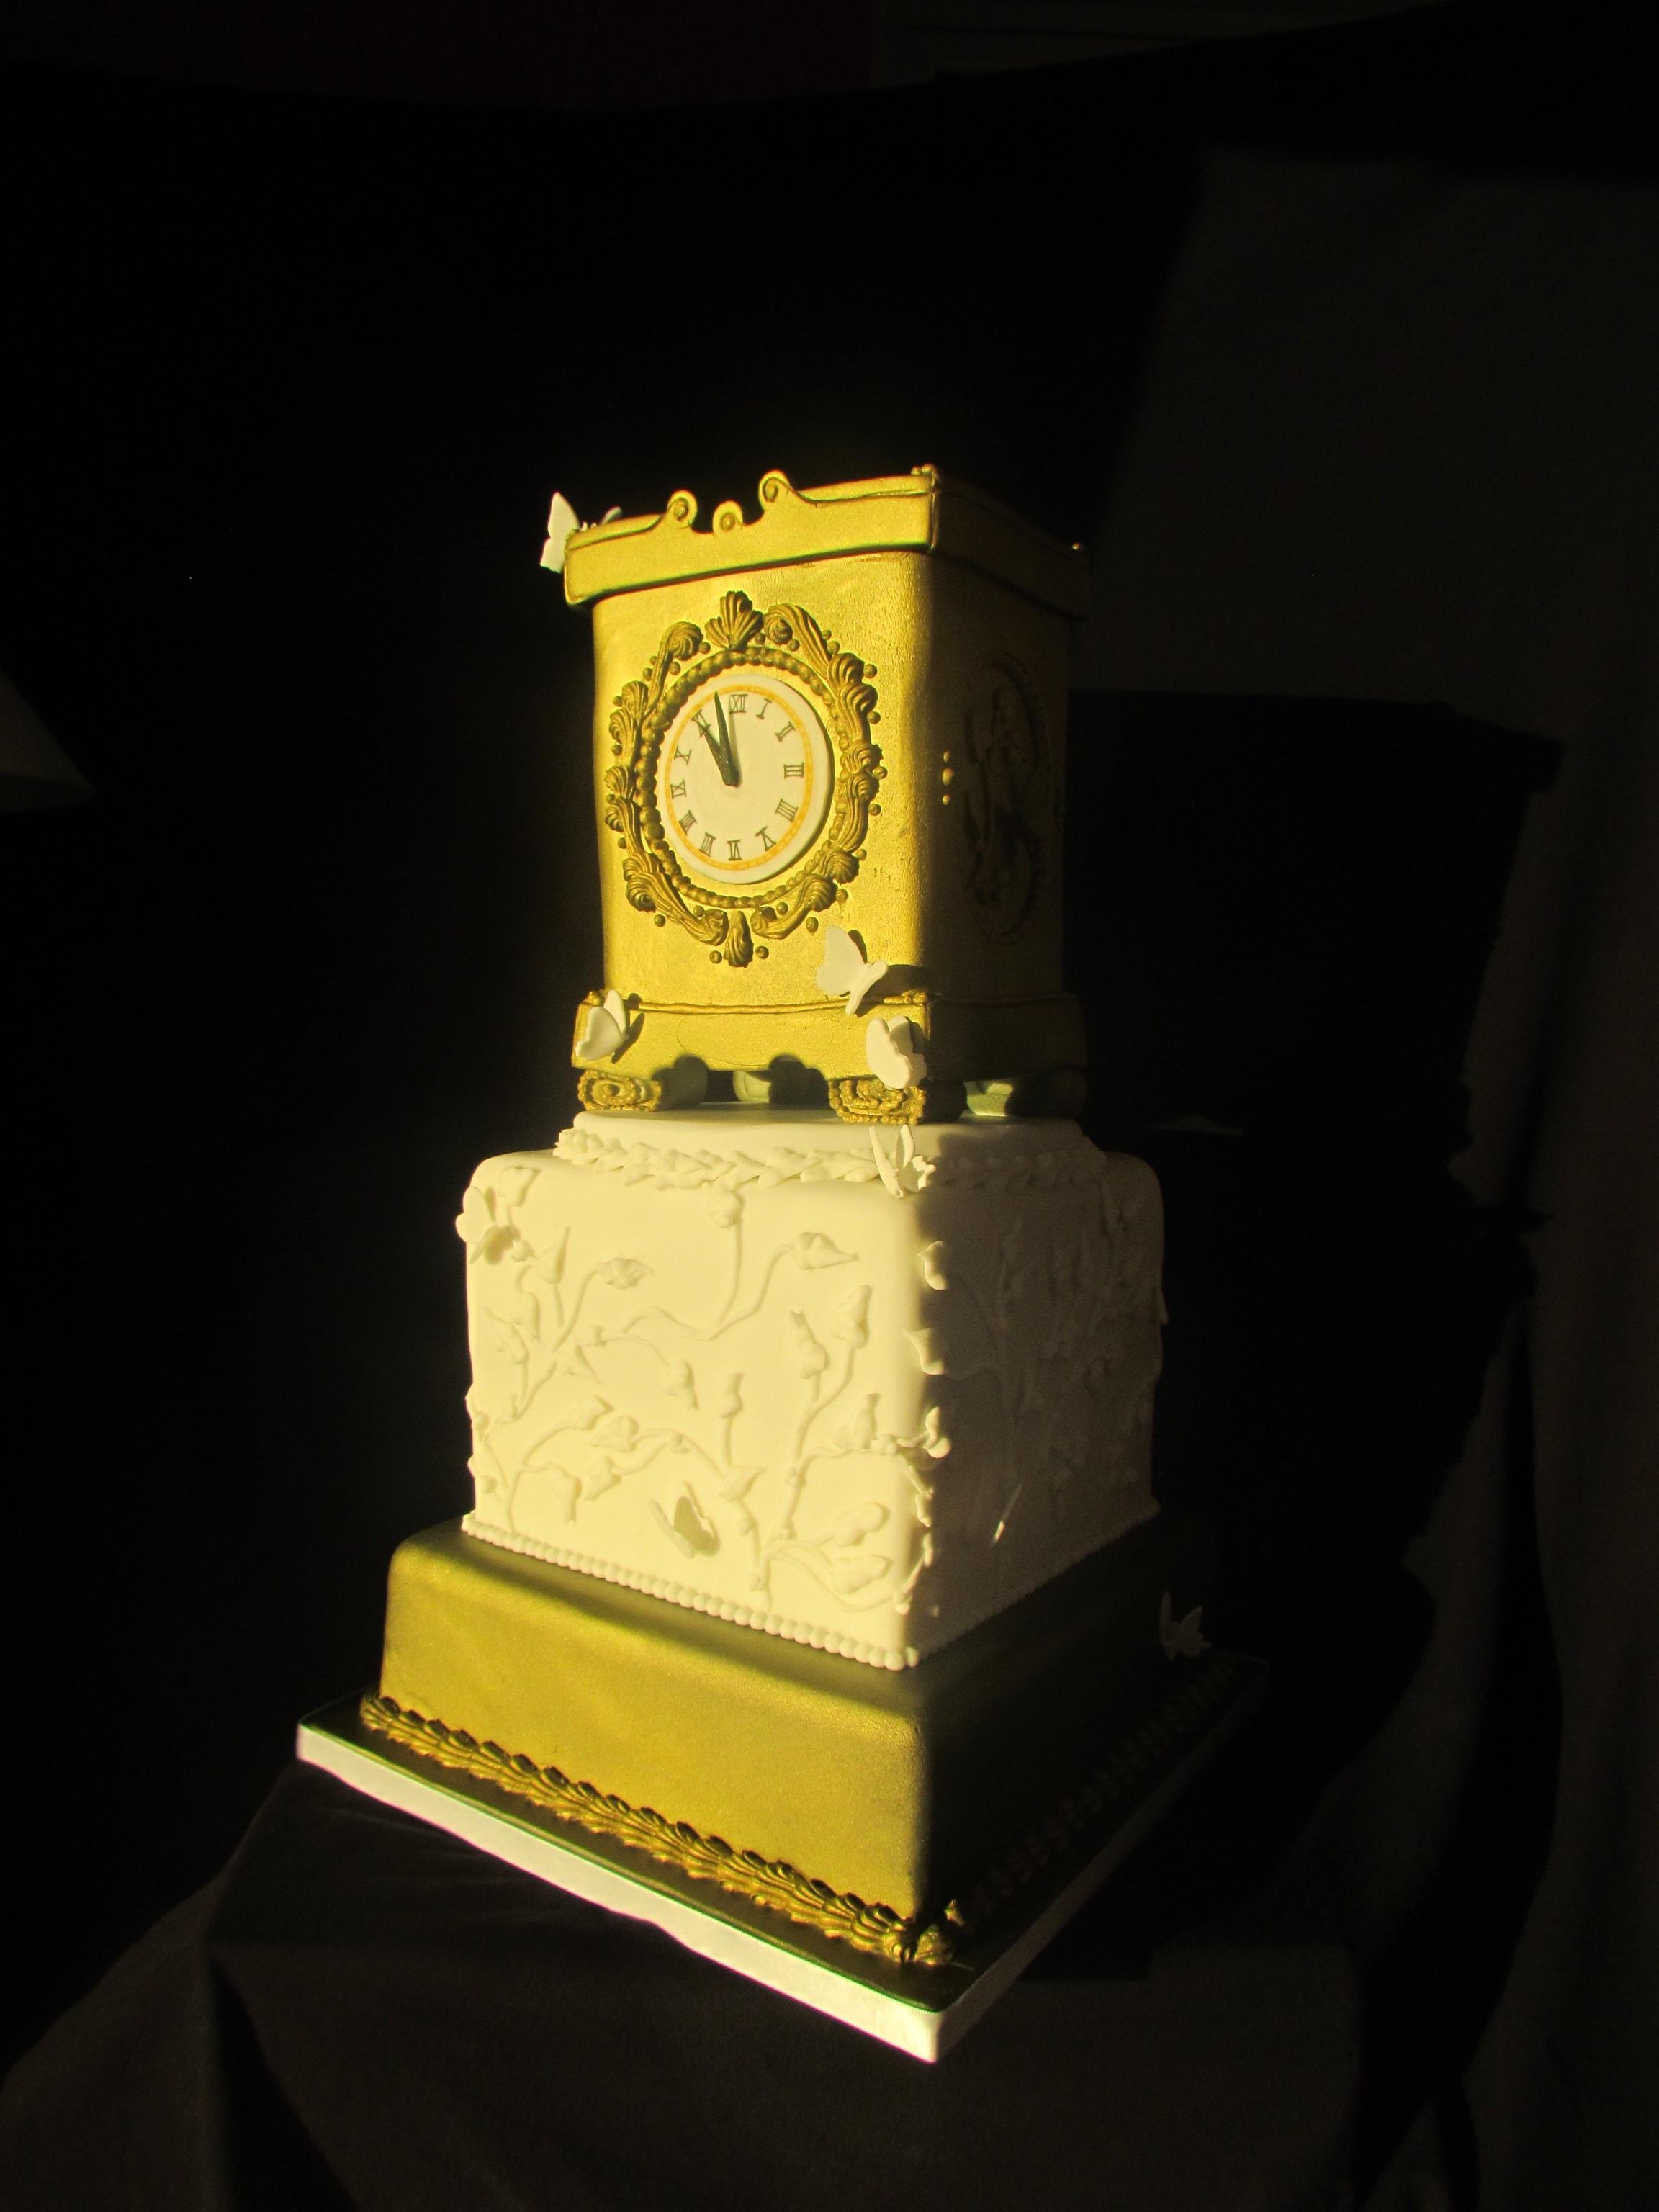 Cake-Peboryon-clock-winner-awards-delicious-cornwall-cakeshow-cake-show